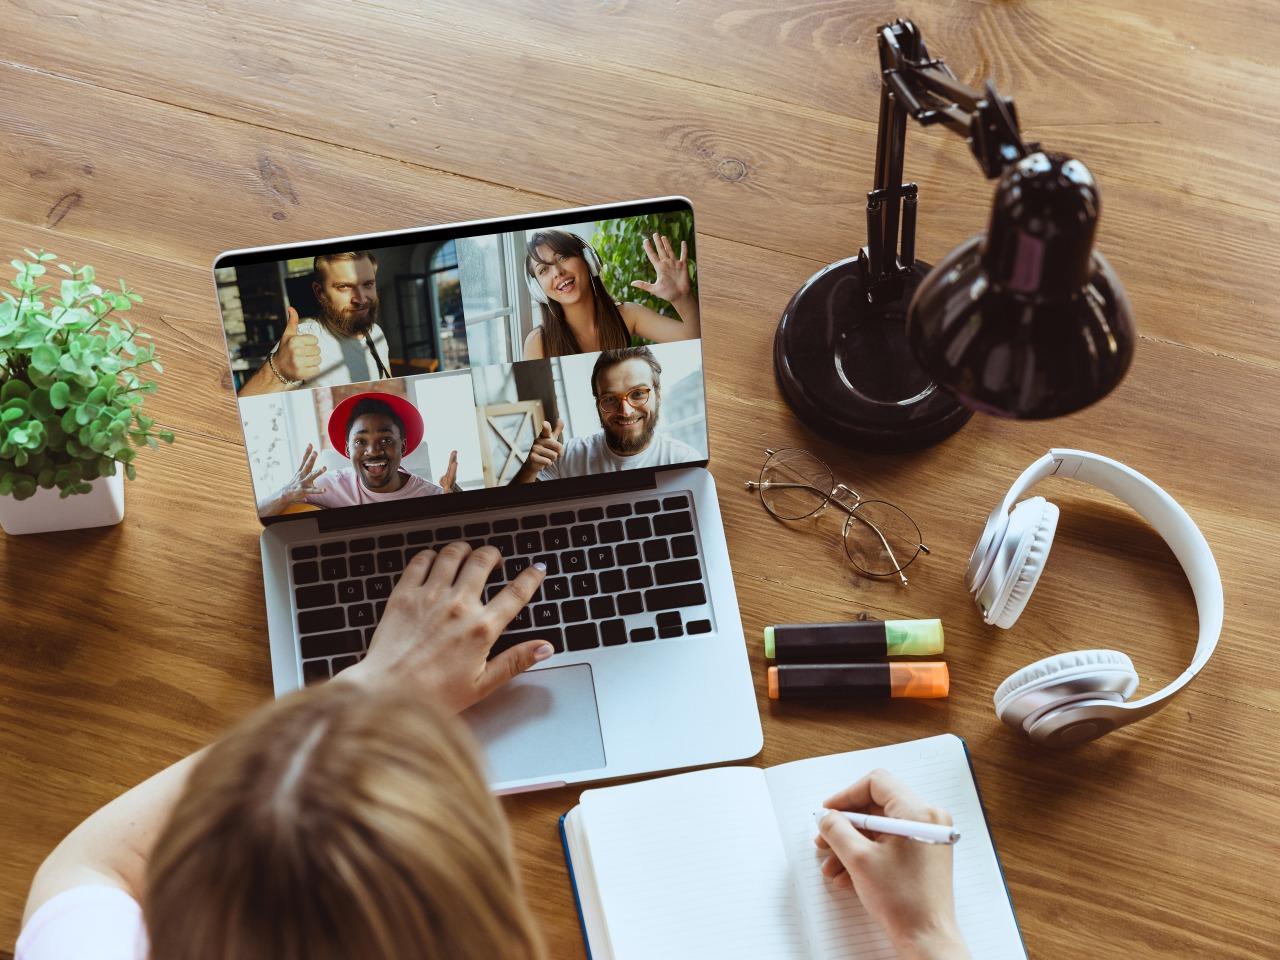 intercontinental hanoi online meeting in room